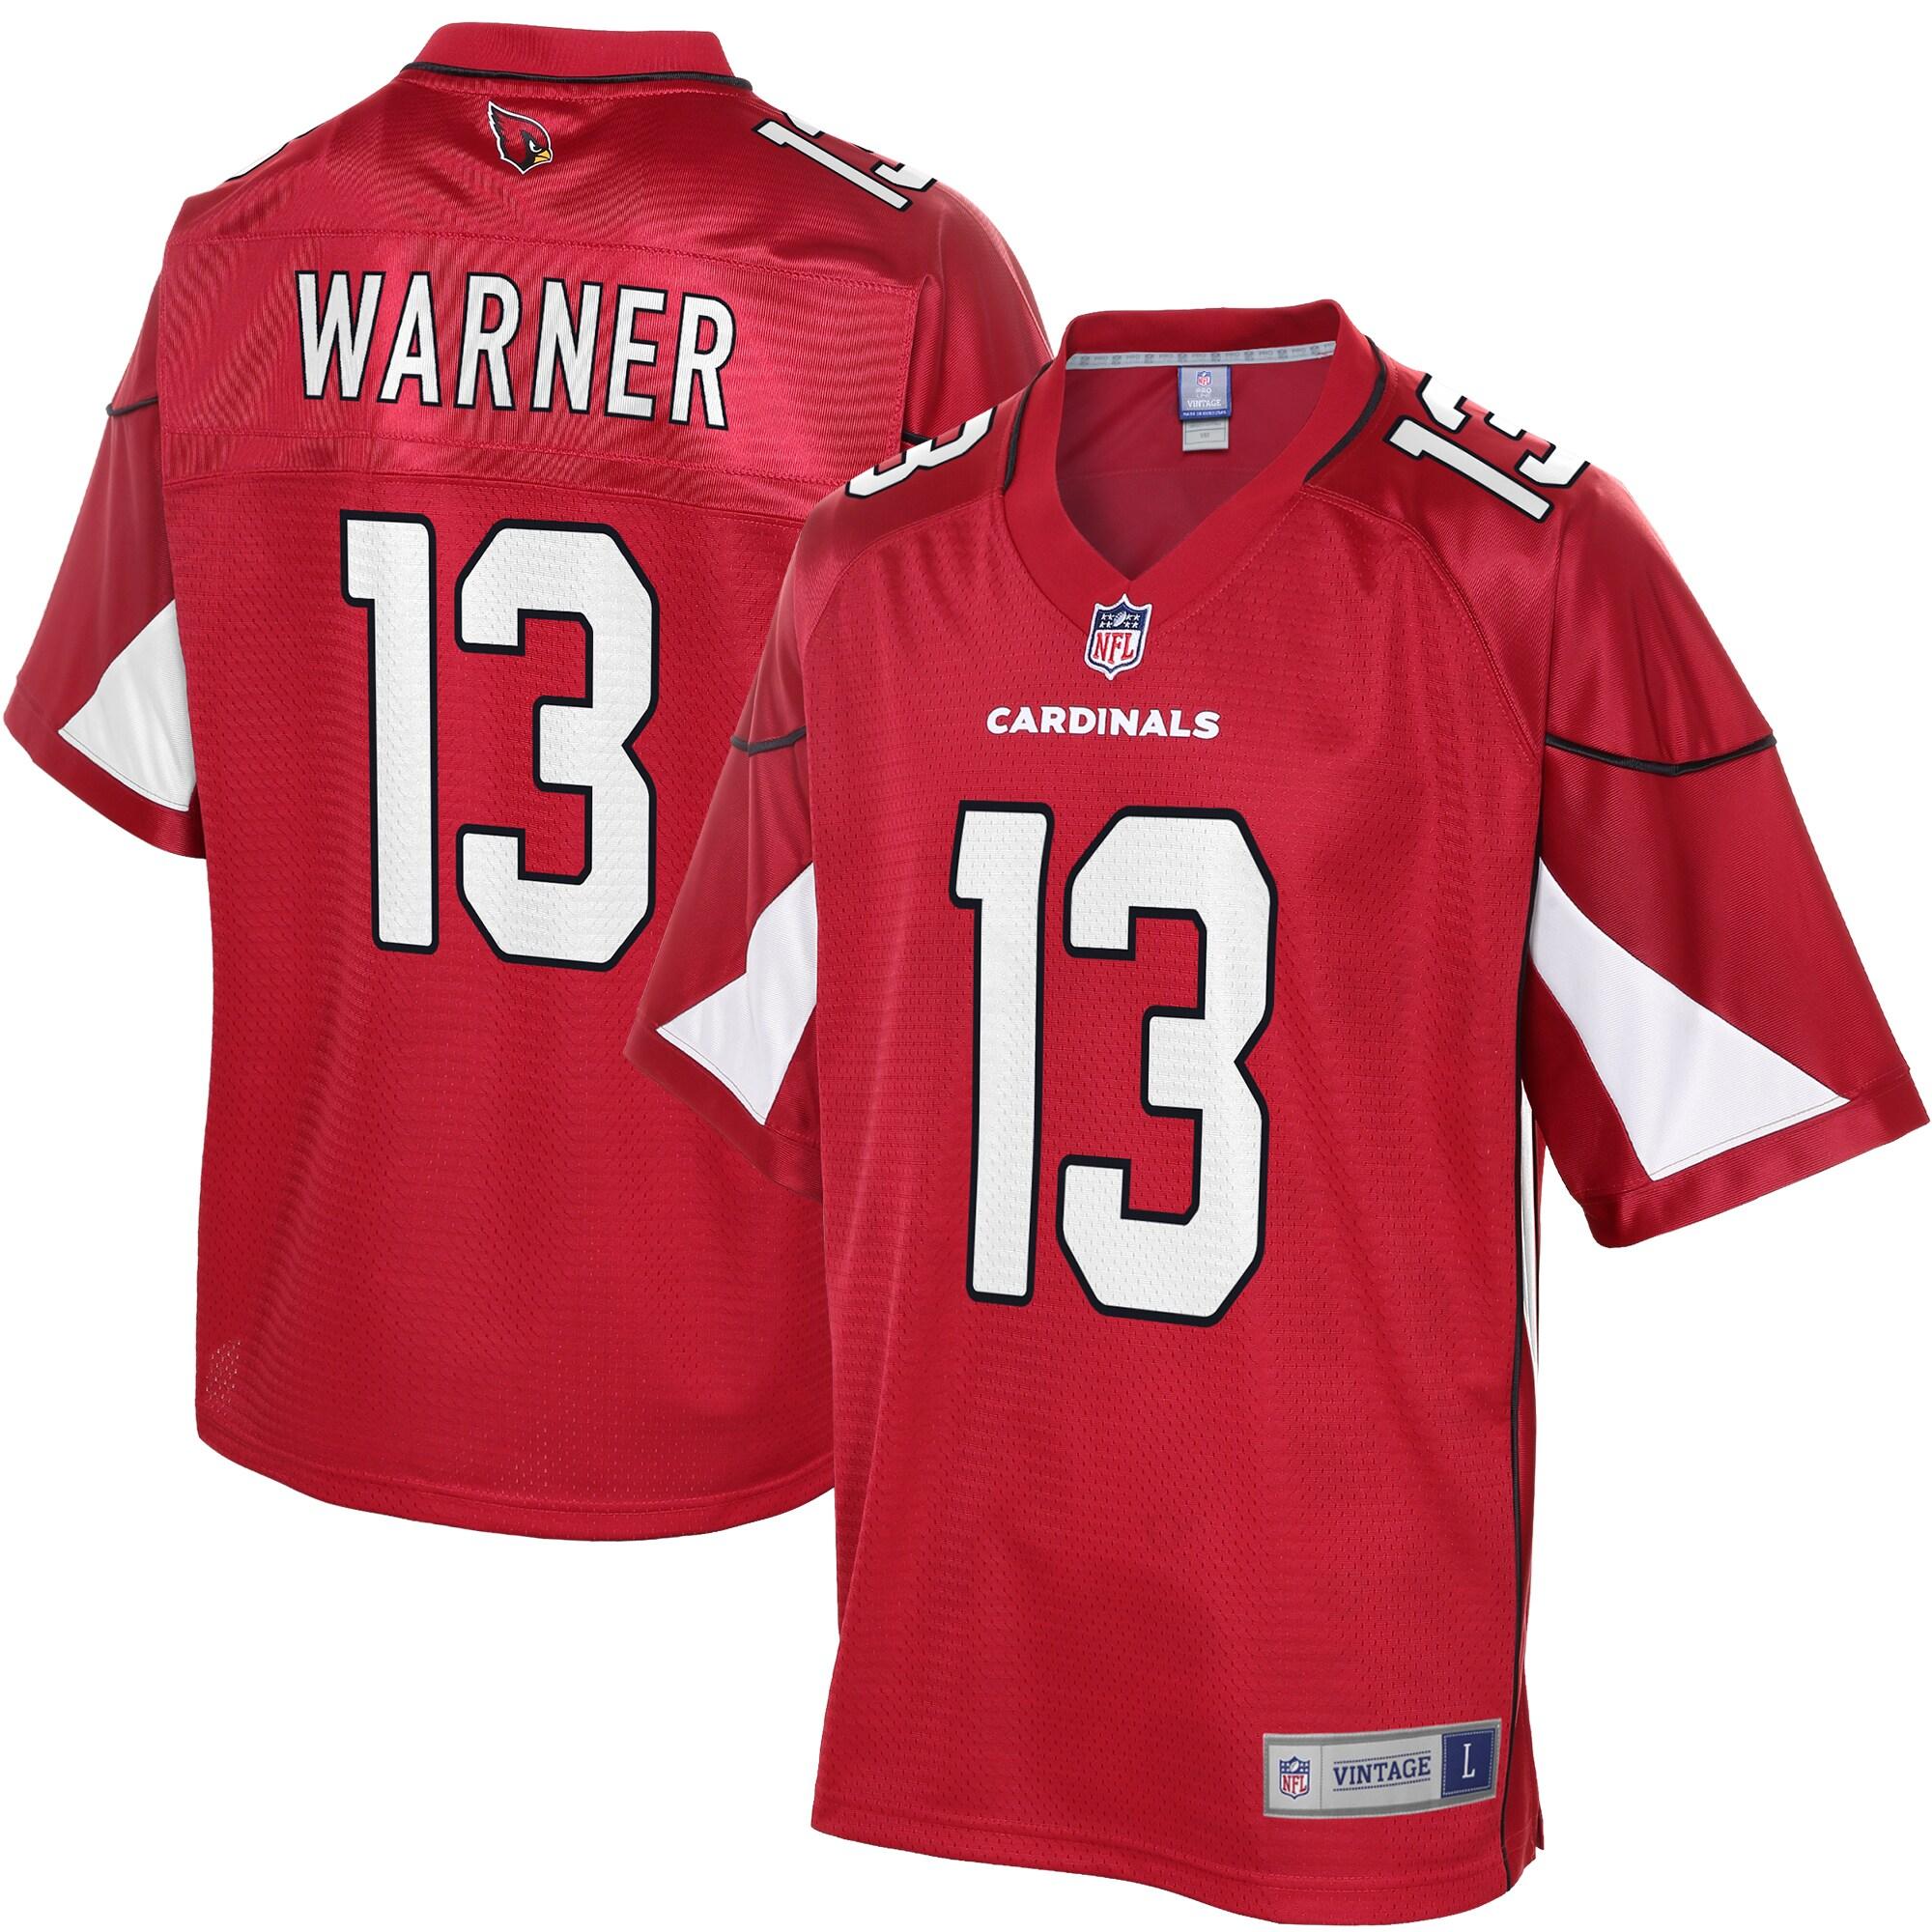 Kurt Warner Arizona Cardinals NFL Pro Line Retired Player Replica Jersey - Cardinal